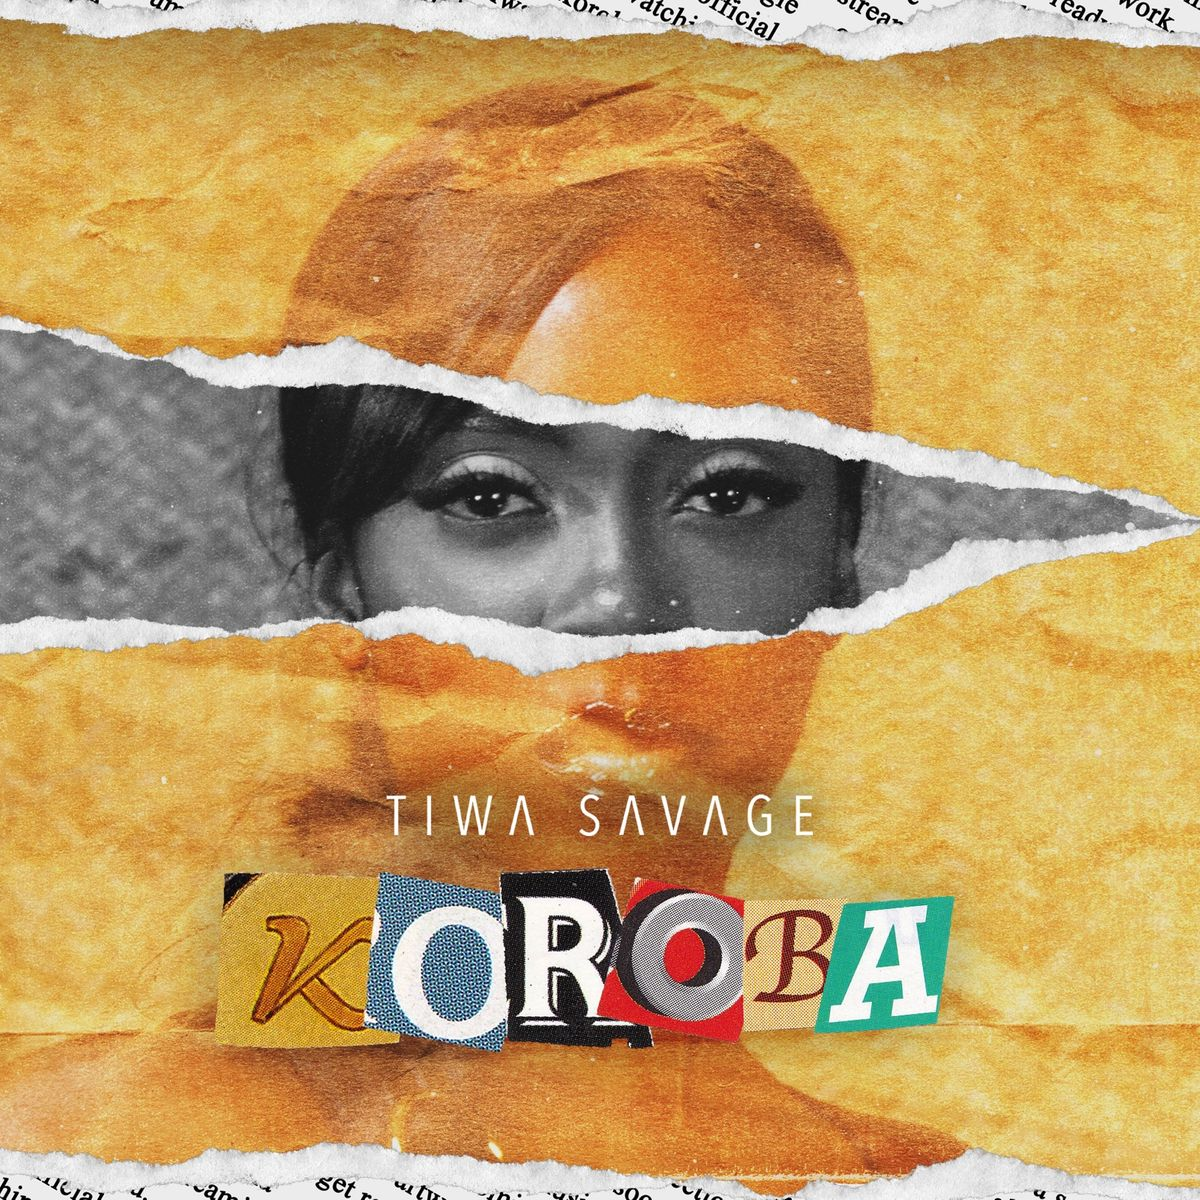 Tiwa Savage - Koroba (Prod. London)